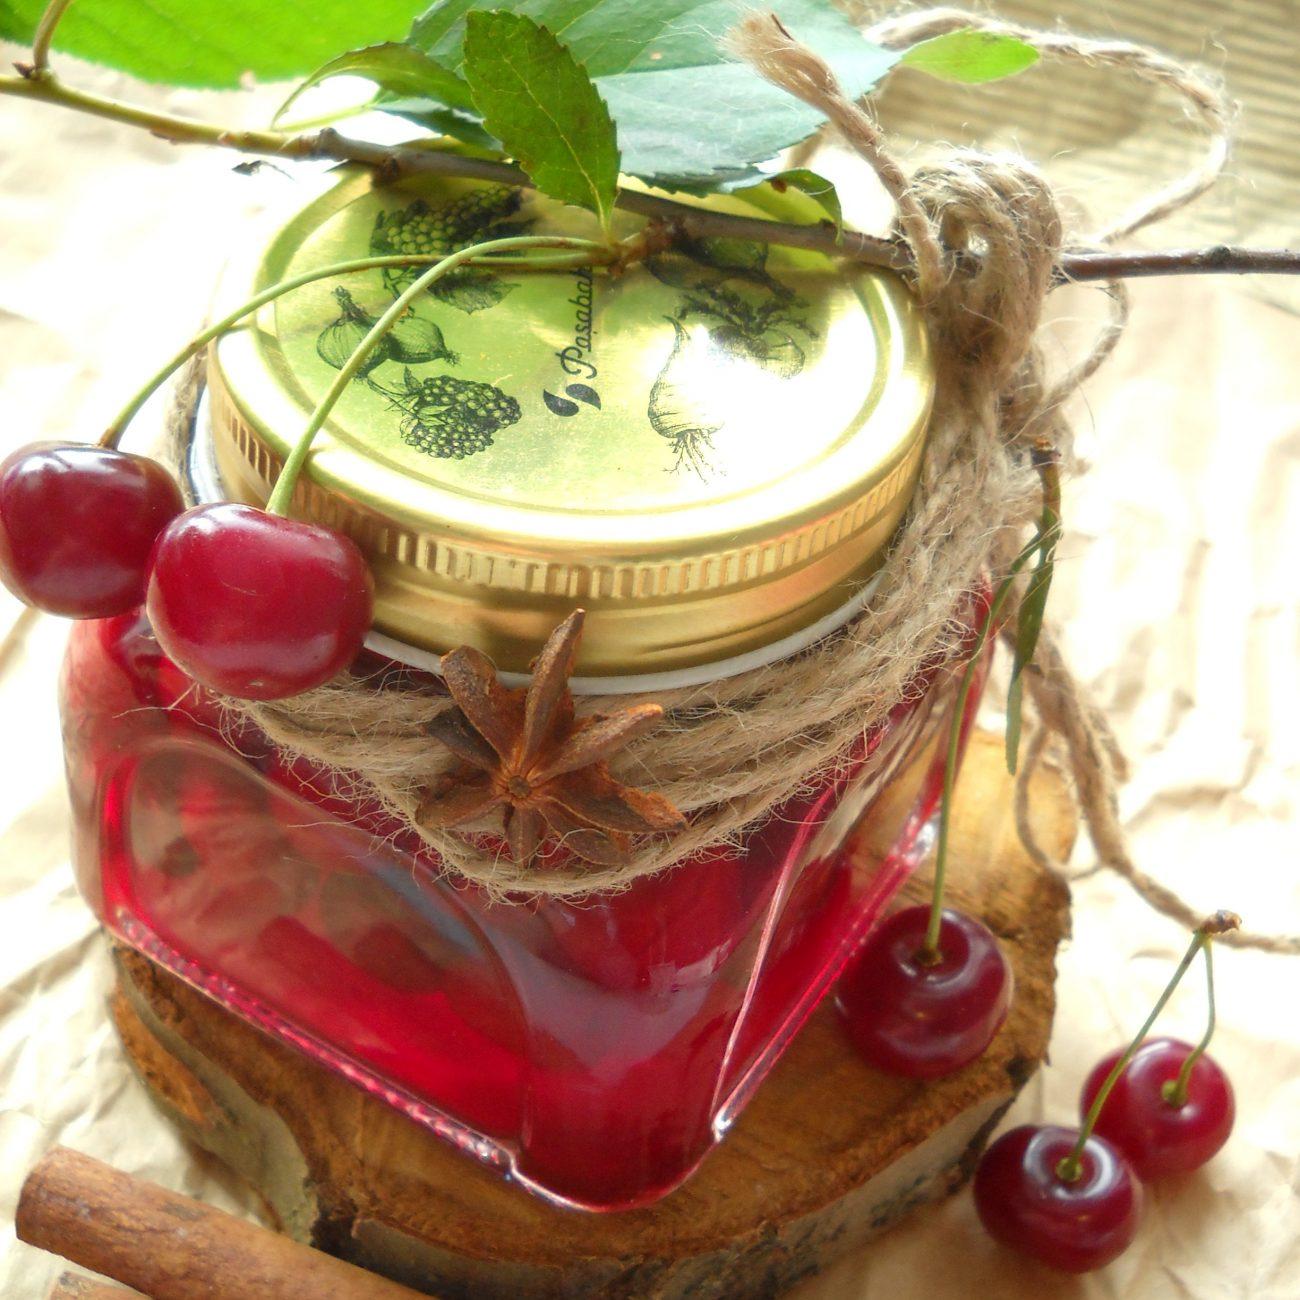 Вишня, консервированная в сахарном сиропе